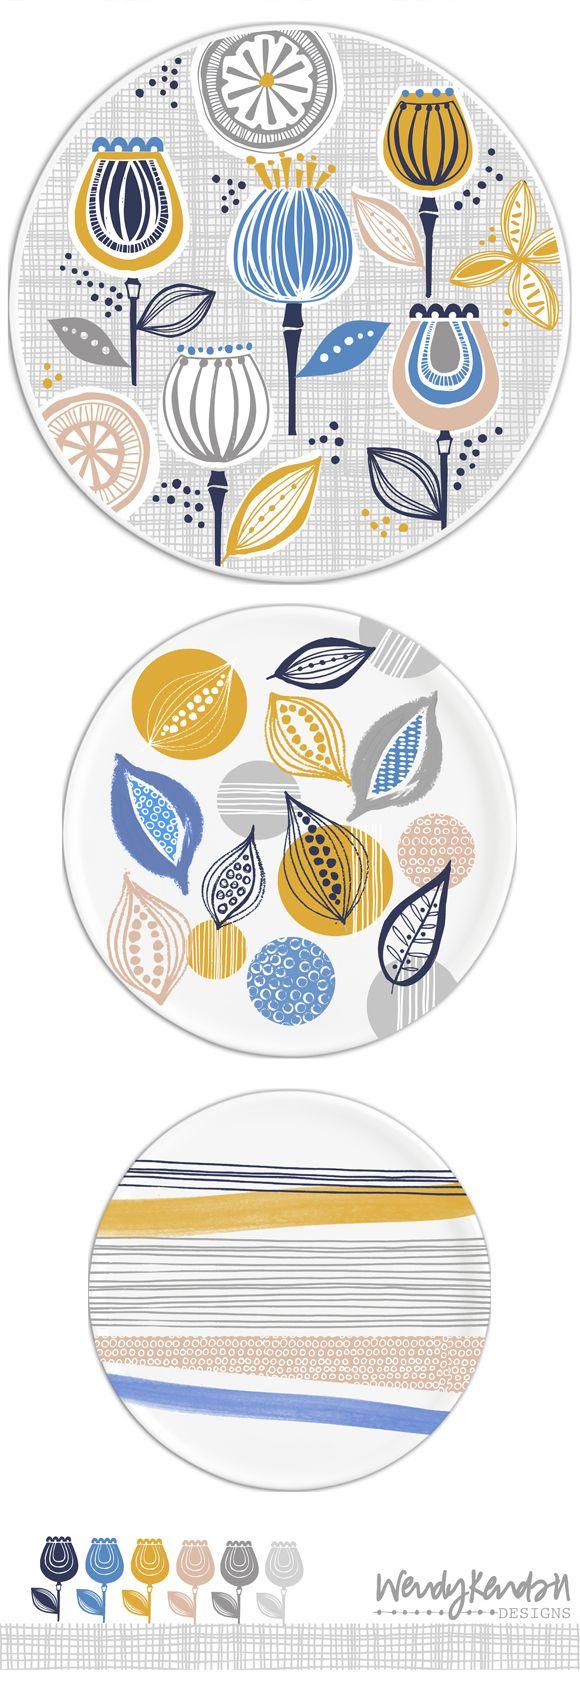 wendy kendall designs – freelance surface pattern designer » flowerpod